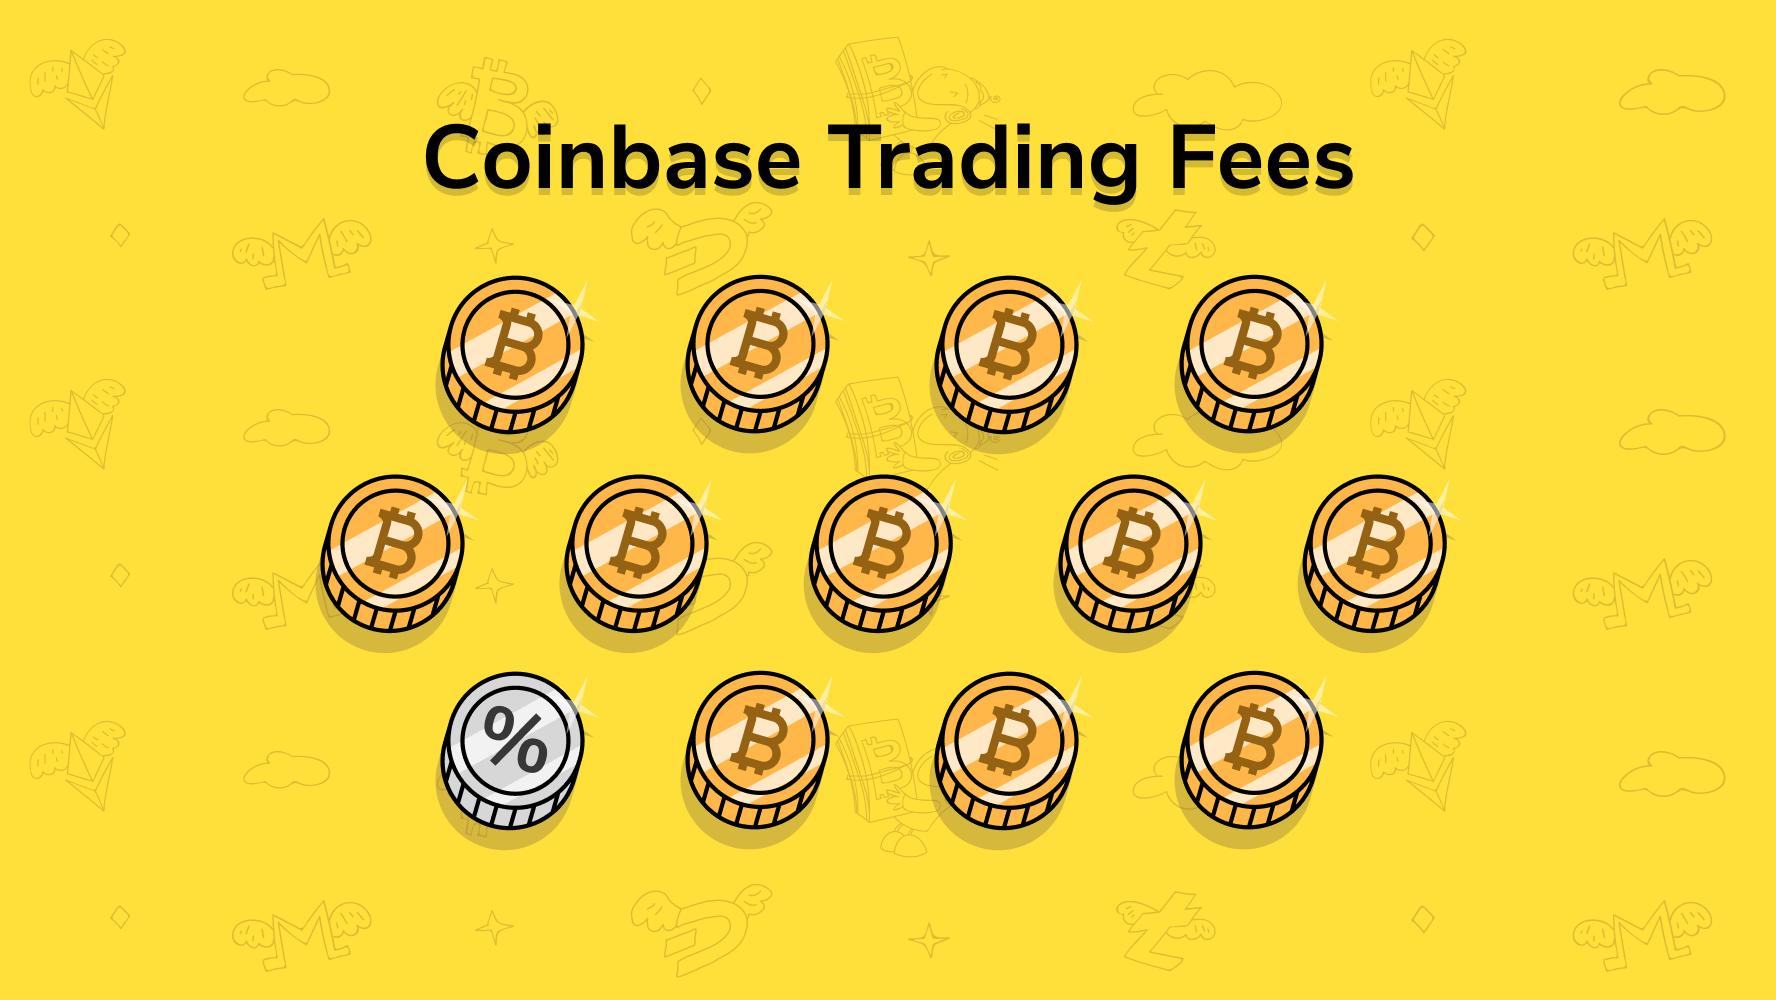 coinbase 2 - Trading On Coinbase Platform 2021